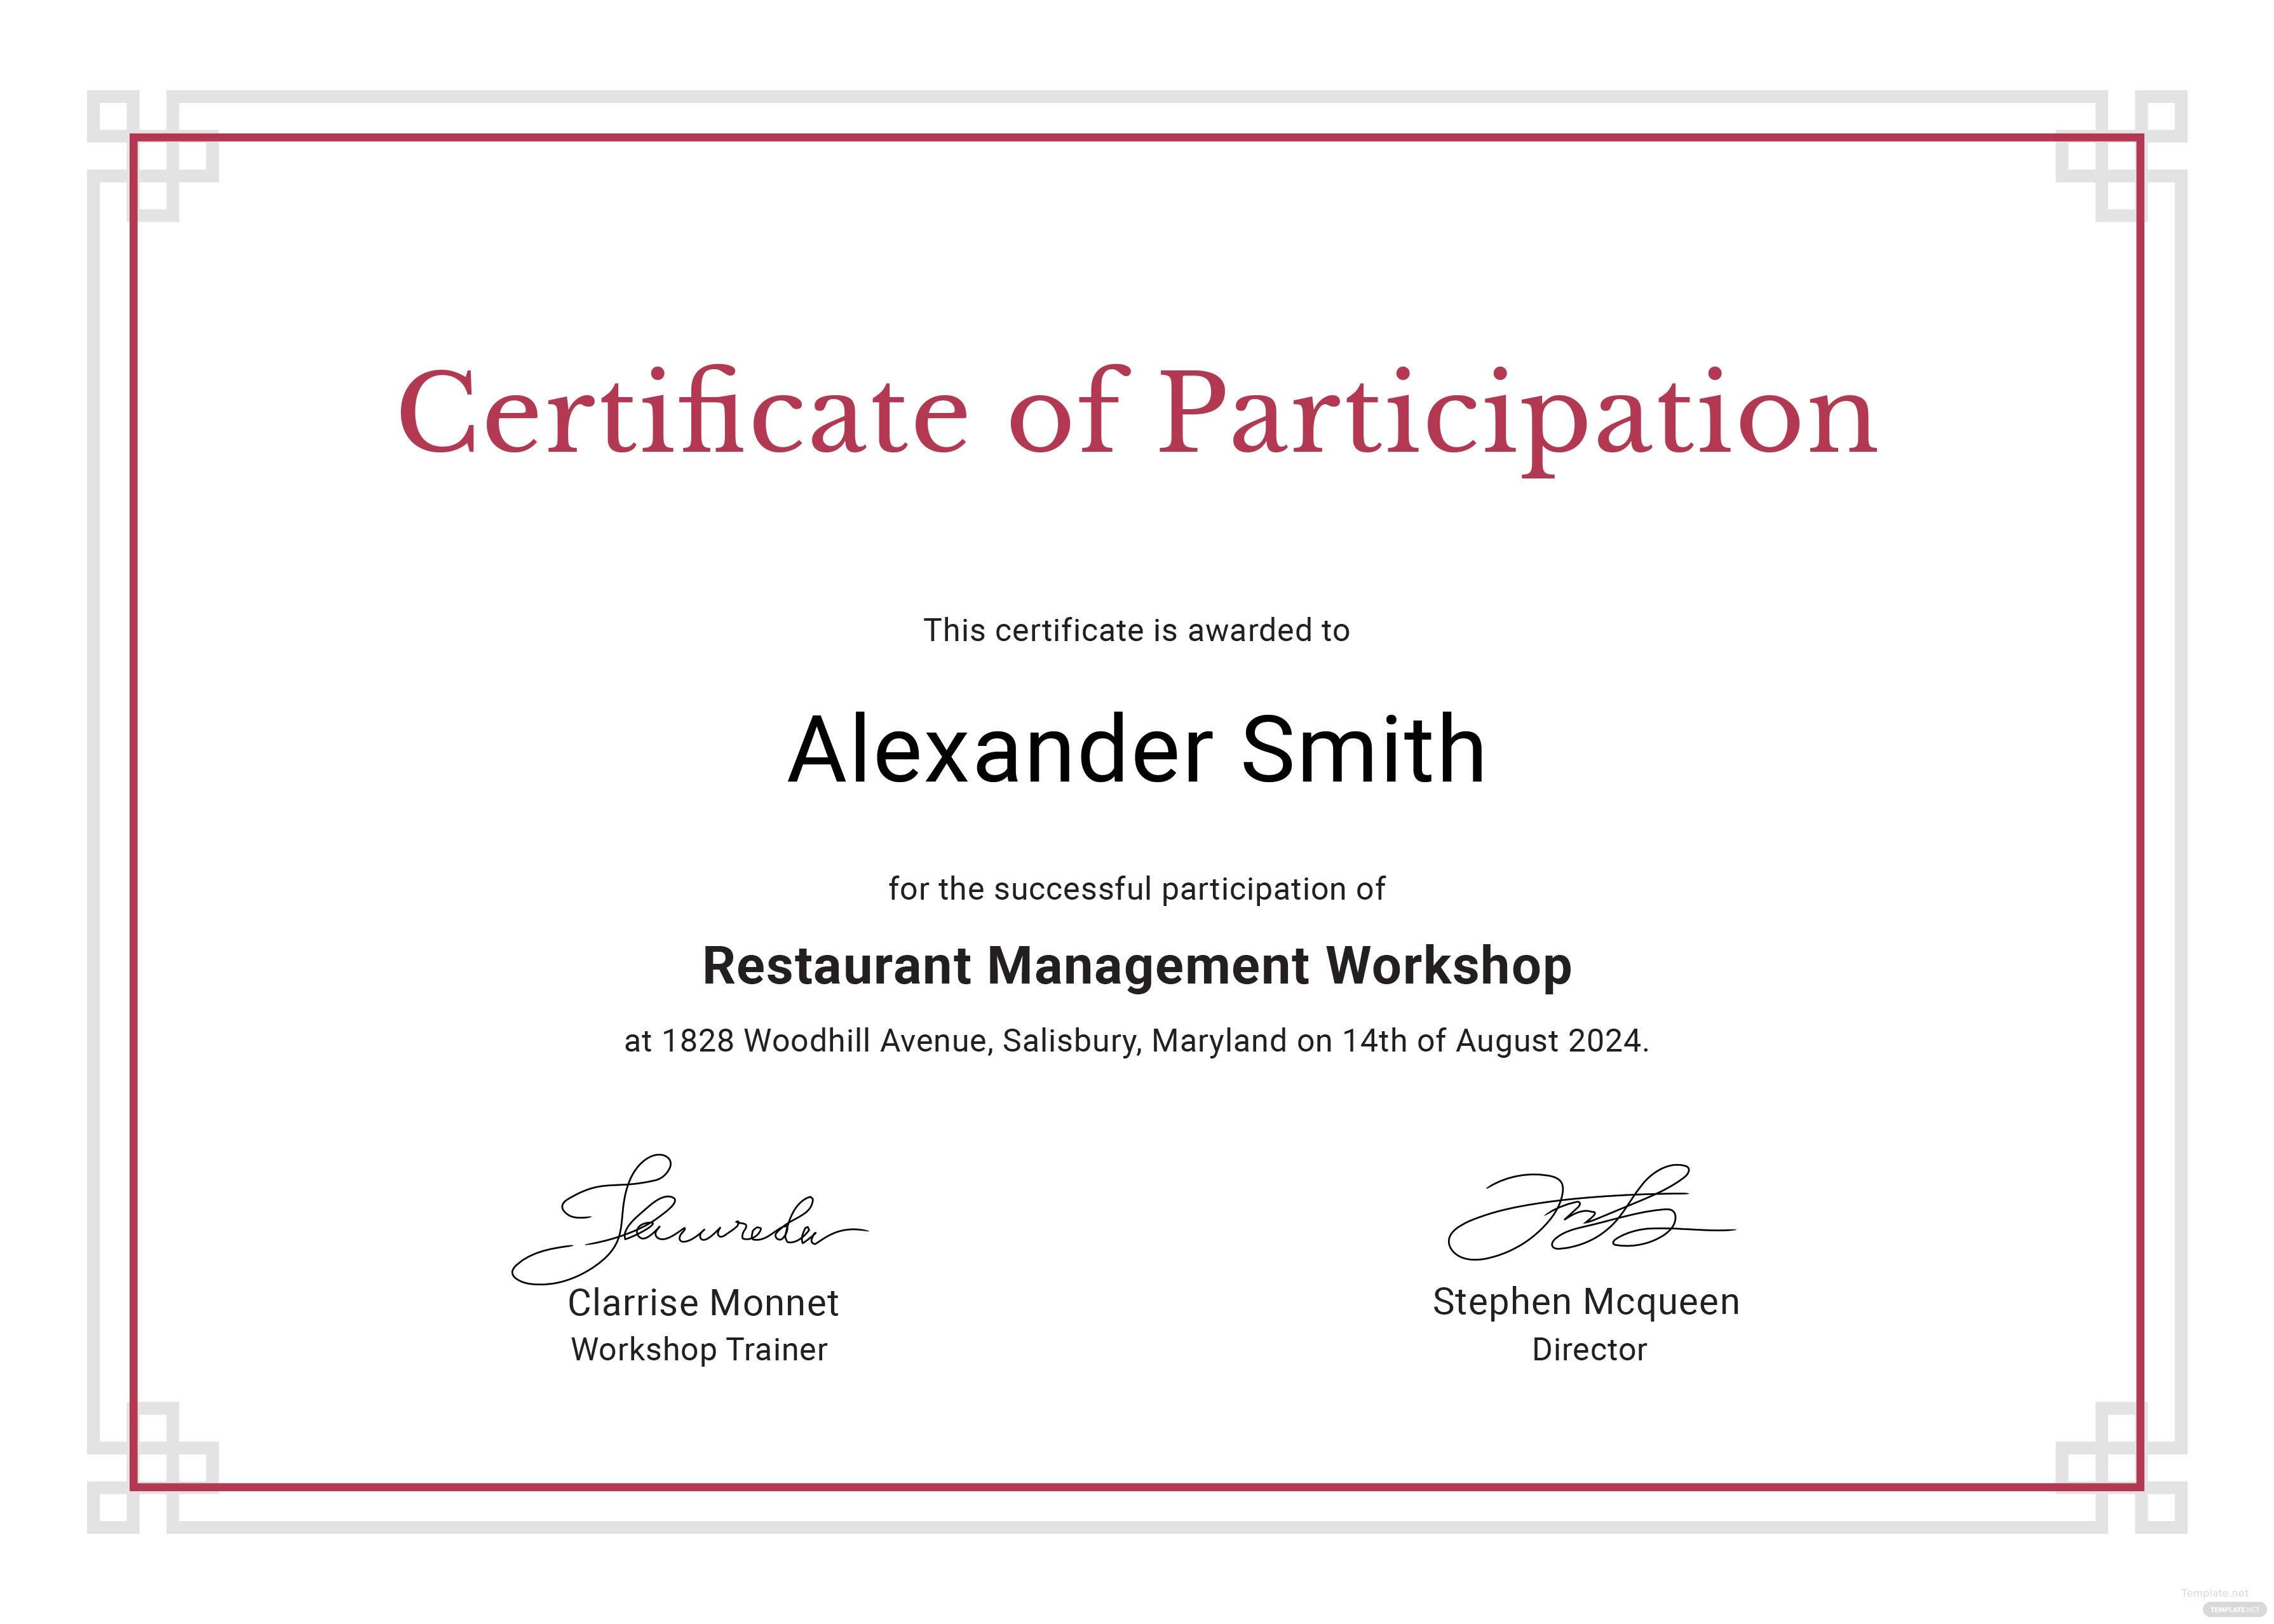 sample participation certificate template in adobe